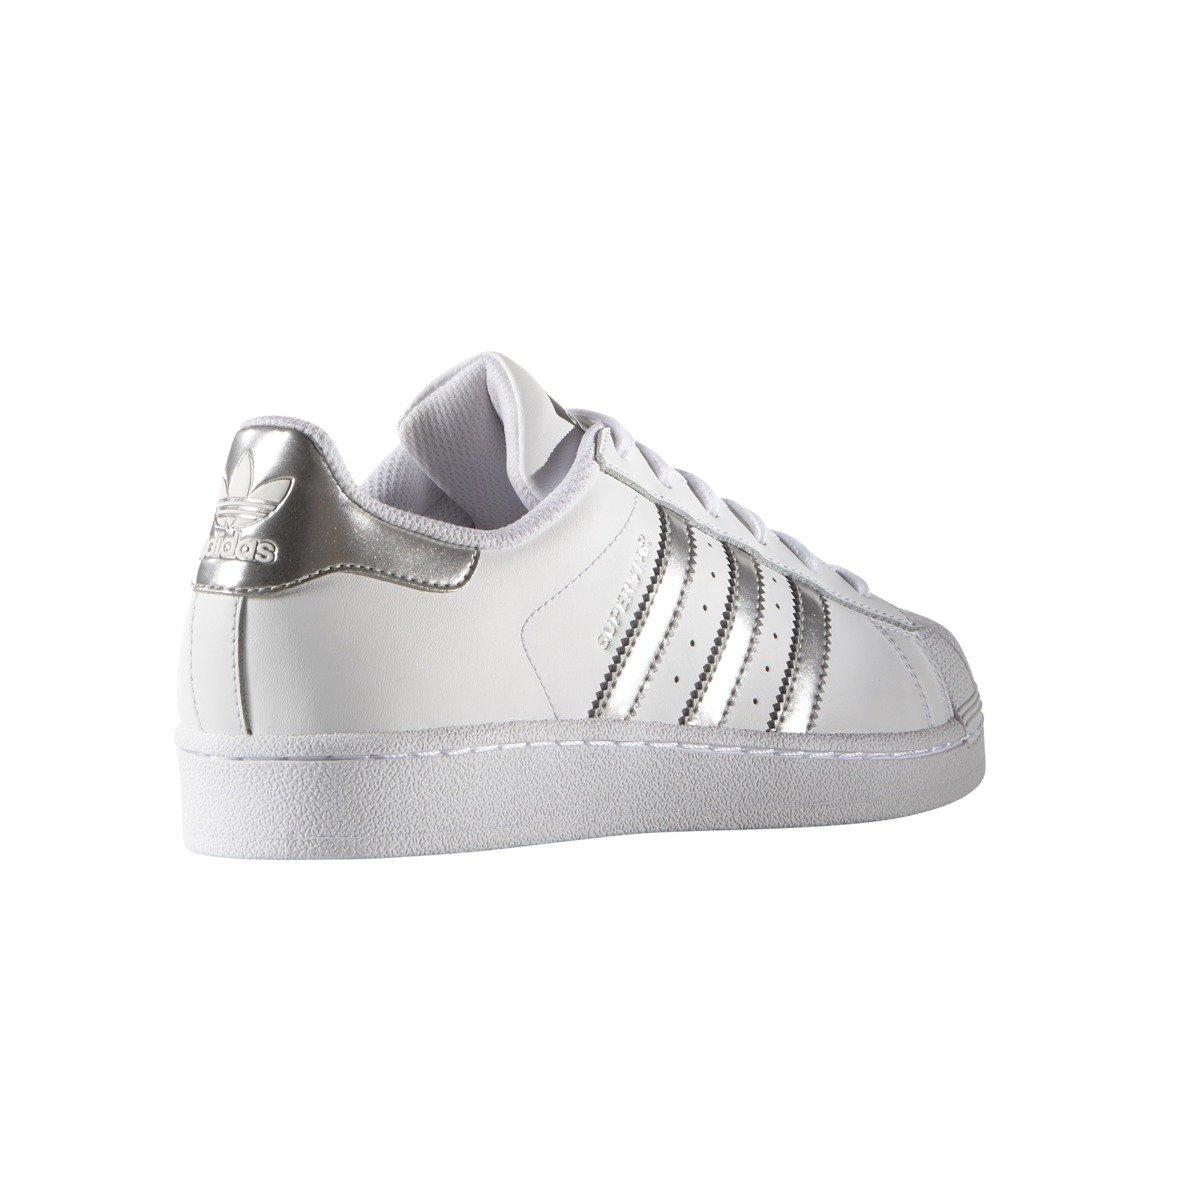 adidas superstar shoes aq3091 basketball shoes casual shoes sklep koszykarski. Black Bedroom Furniture Sets. Home Design Ideas